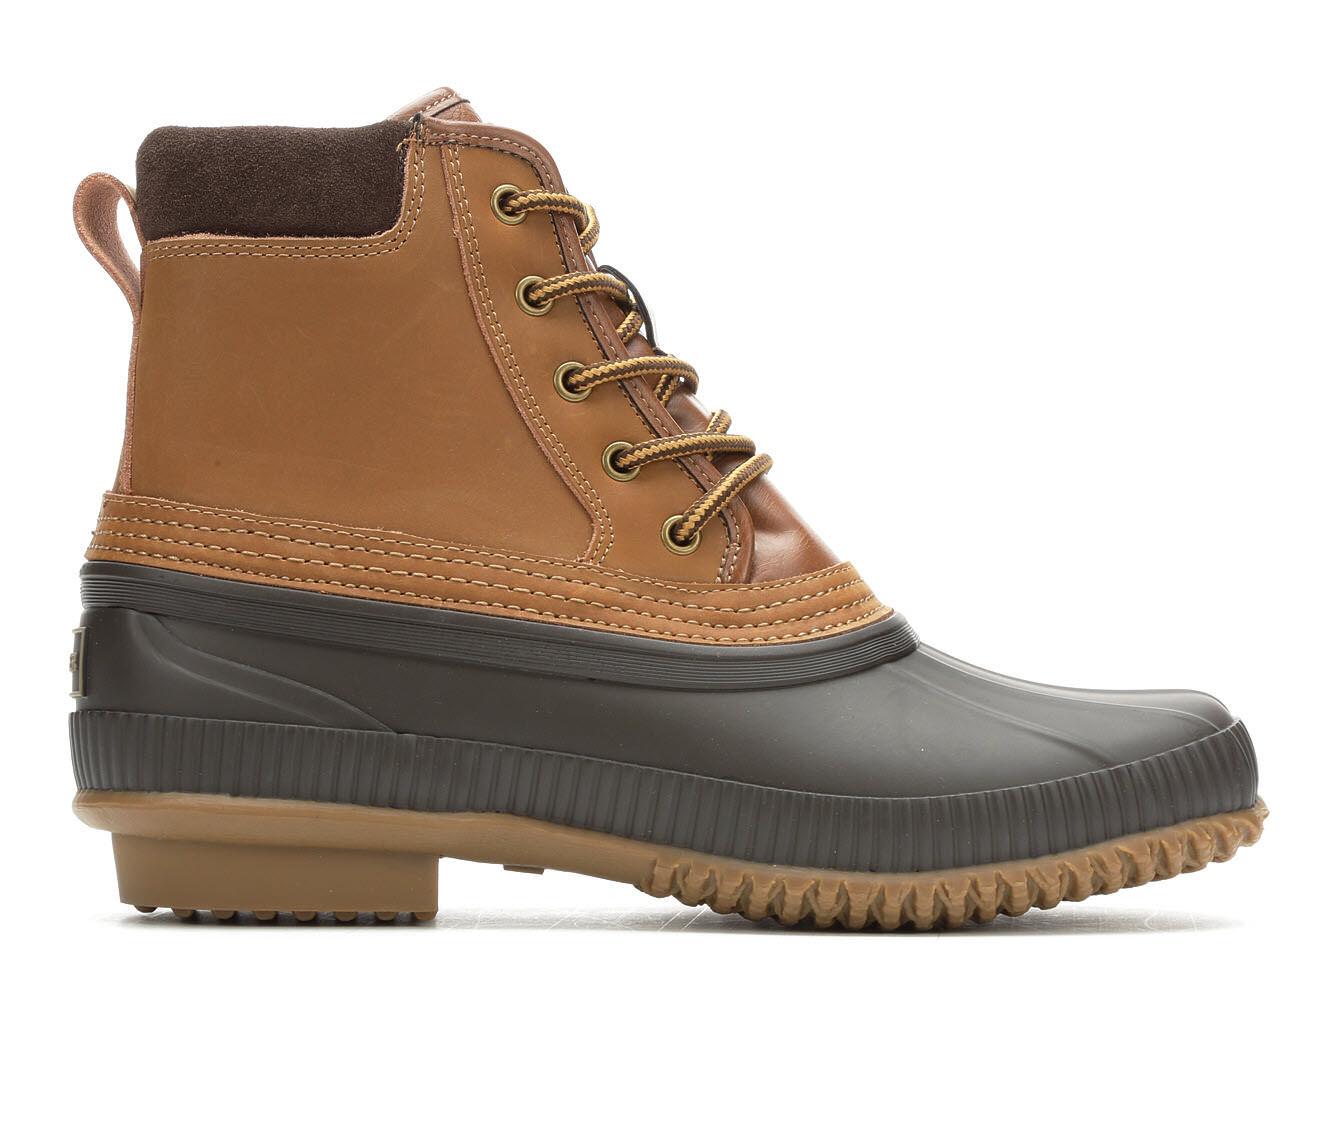 Men's Tommy Hilfiger TM-Casey Winter Boots Cognac/Coffee